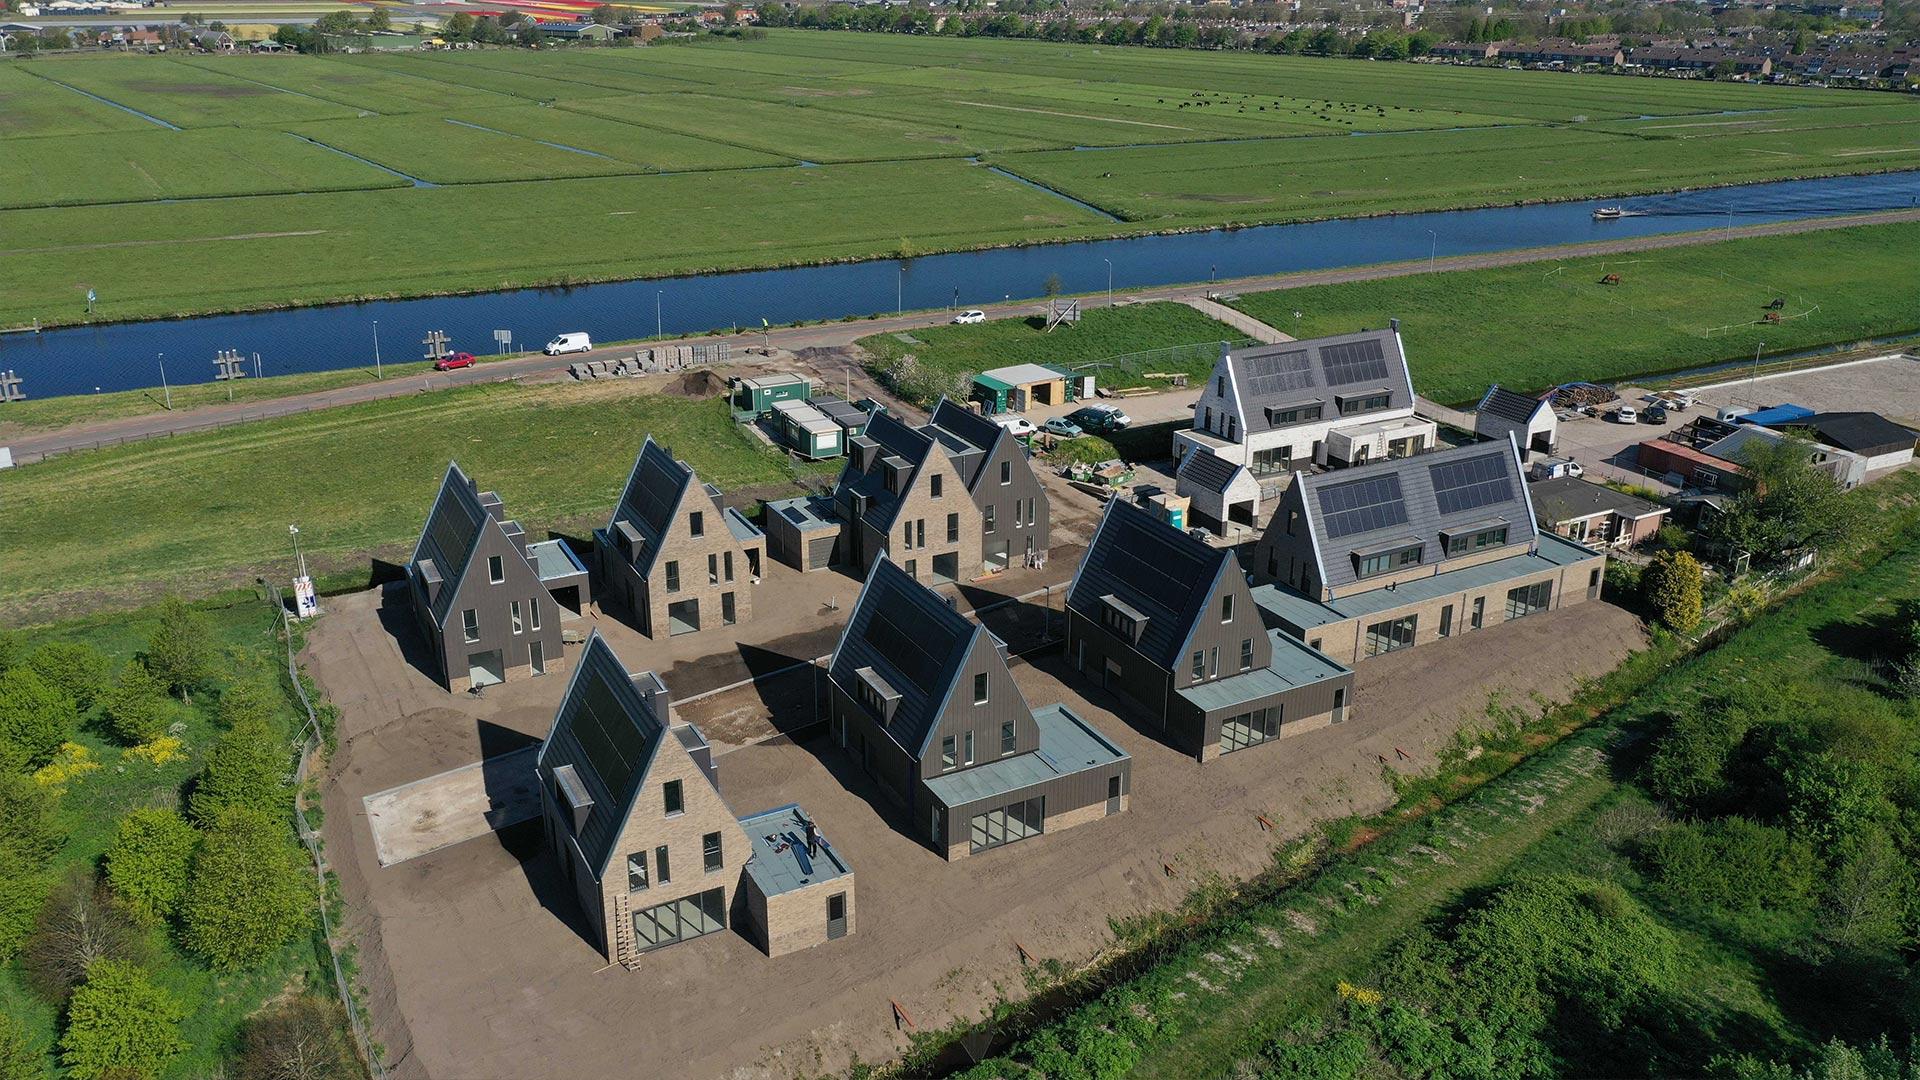 Bouwgroep Horsman & co project Quirina Hoeve Haarlemmermeer